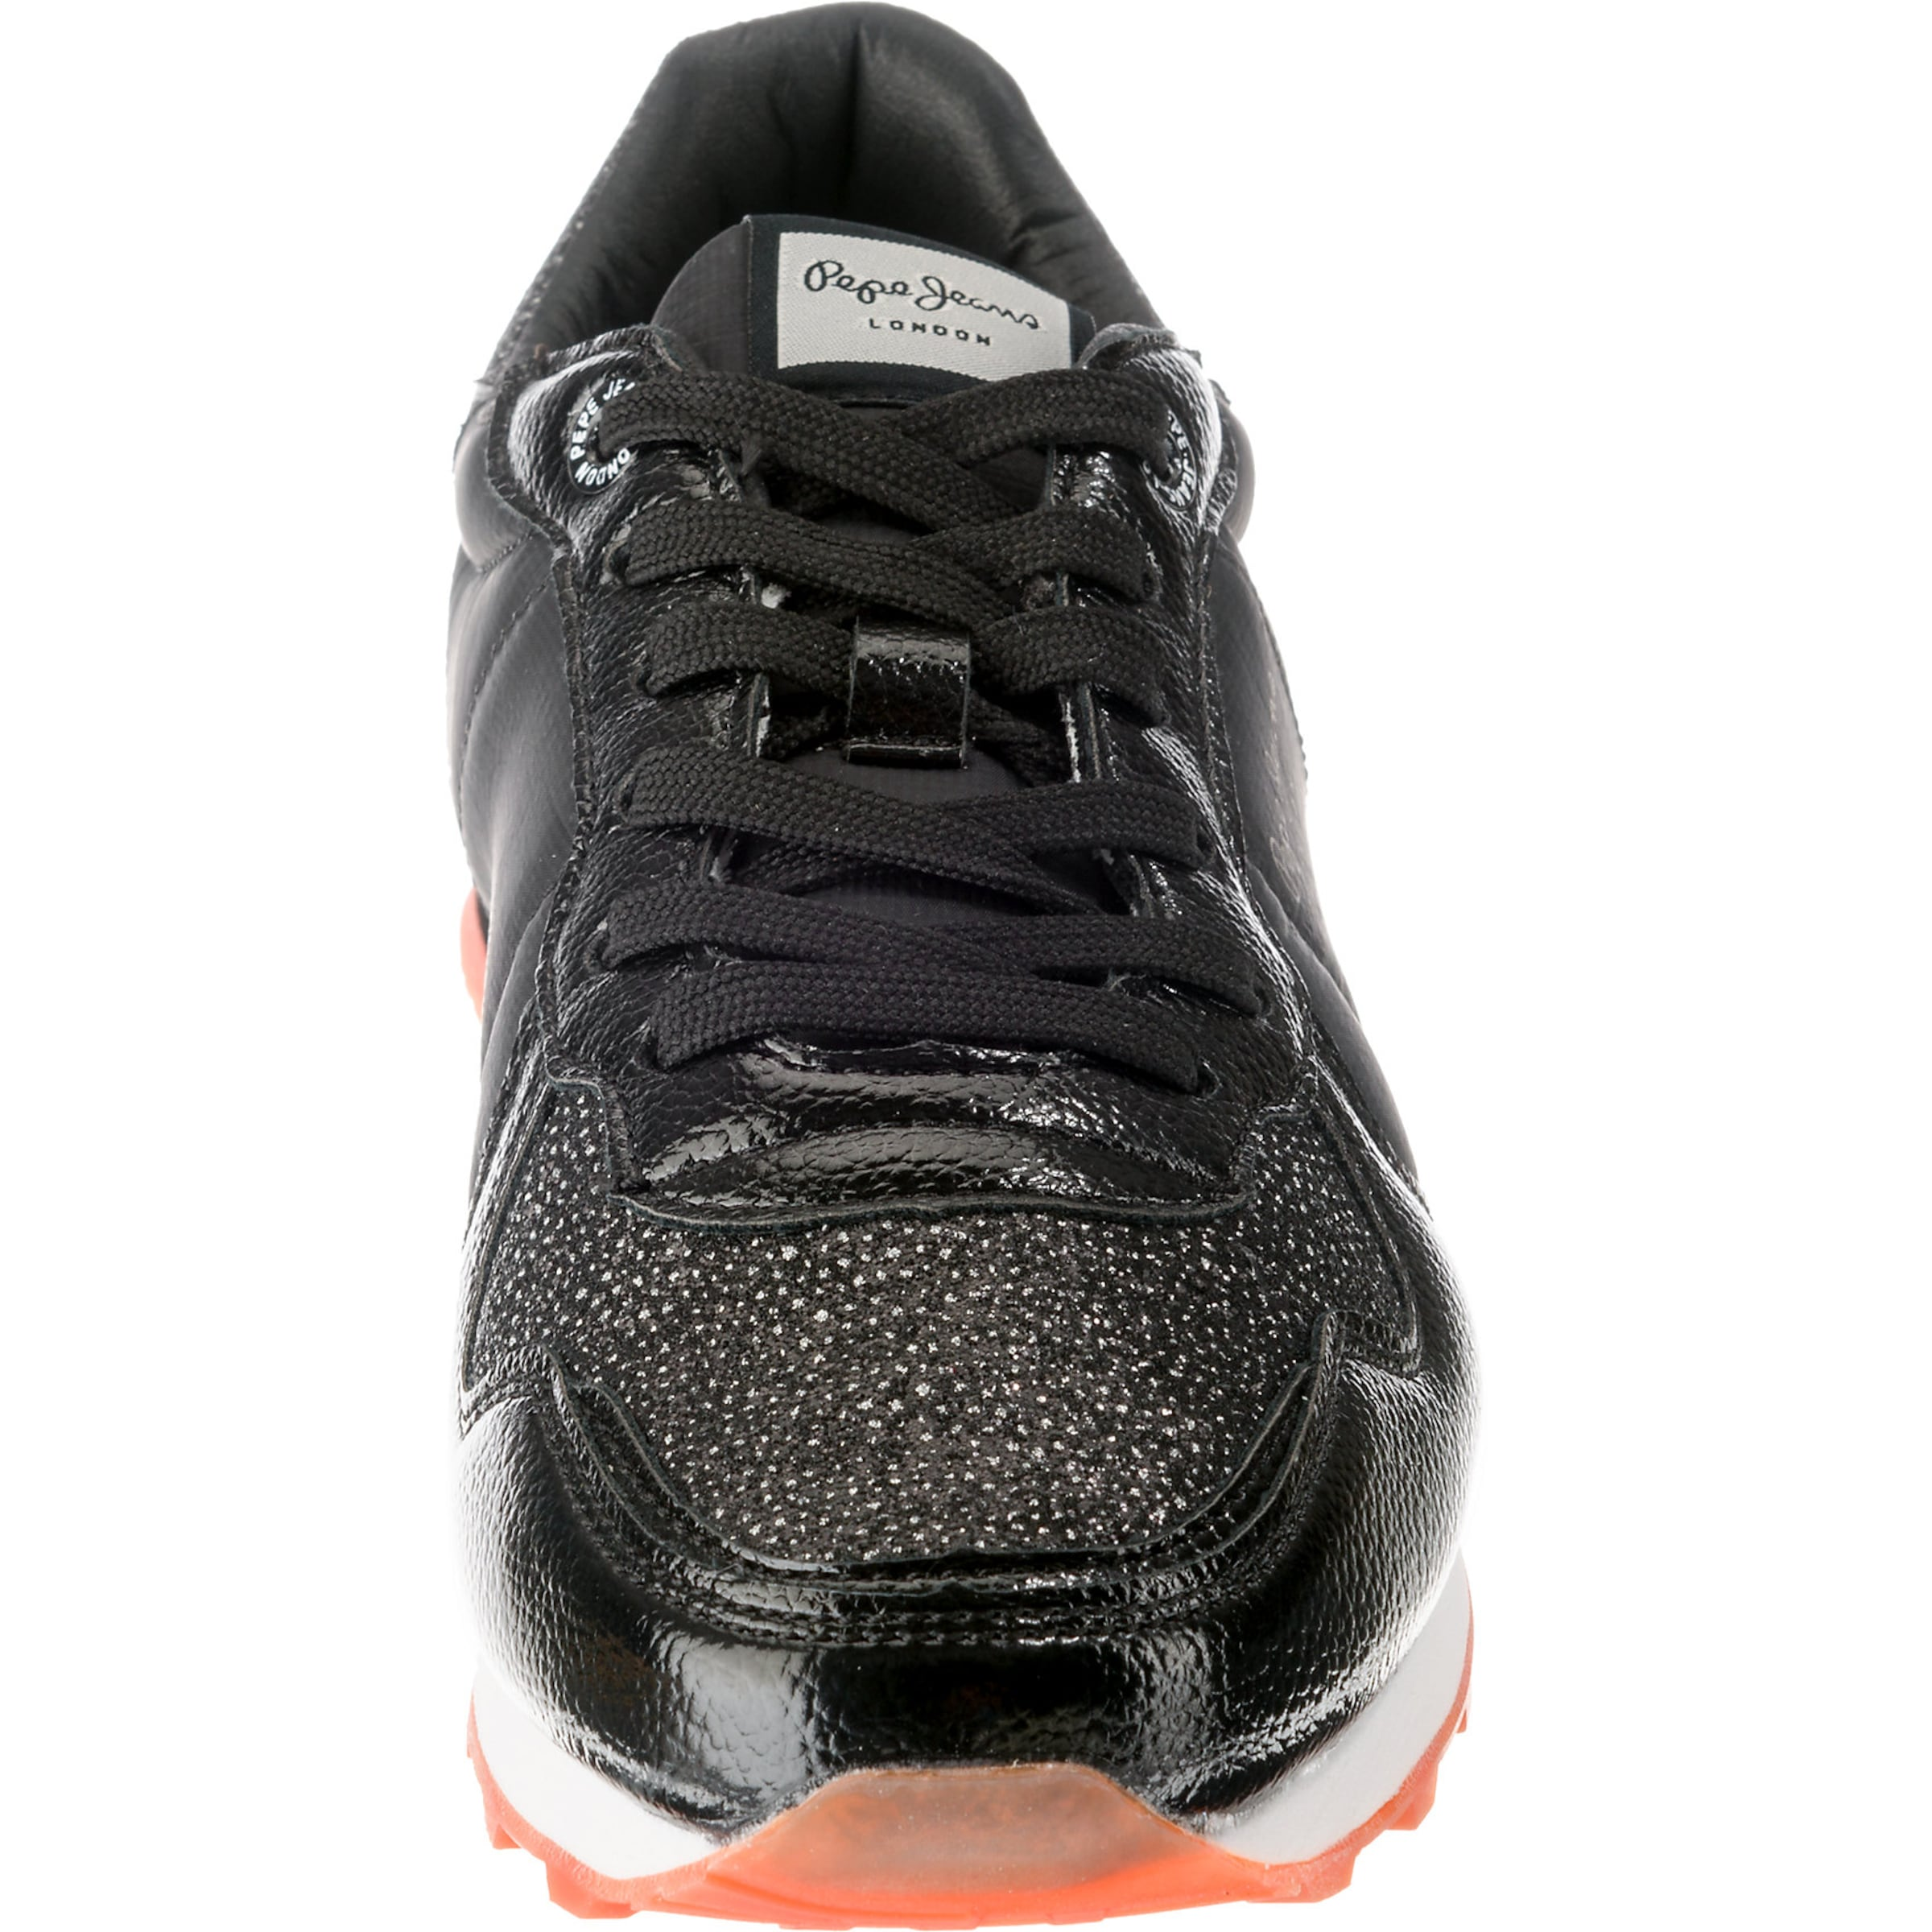 Winner' SchwarzSilber 'verona Sneaker In Jeans Pepe q3S5ALc4Rj